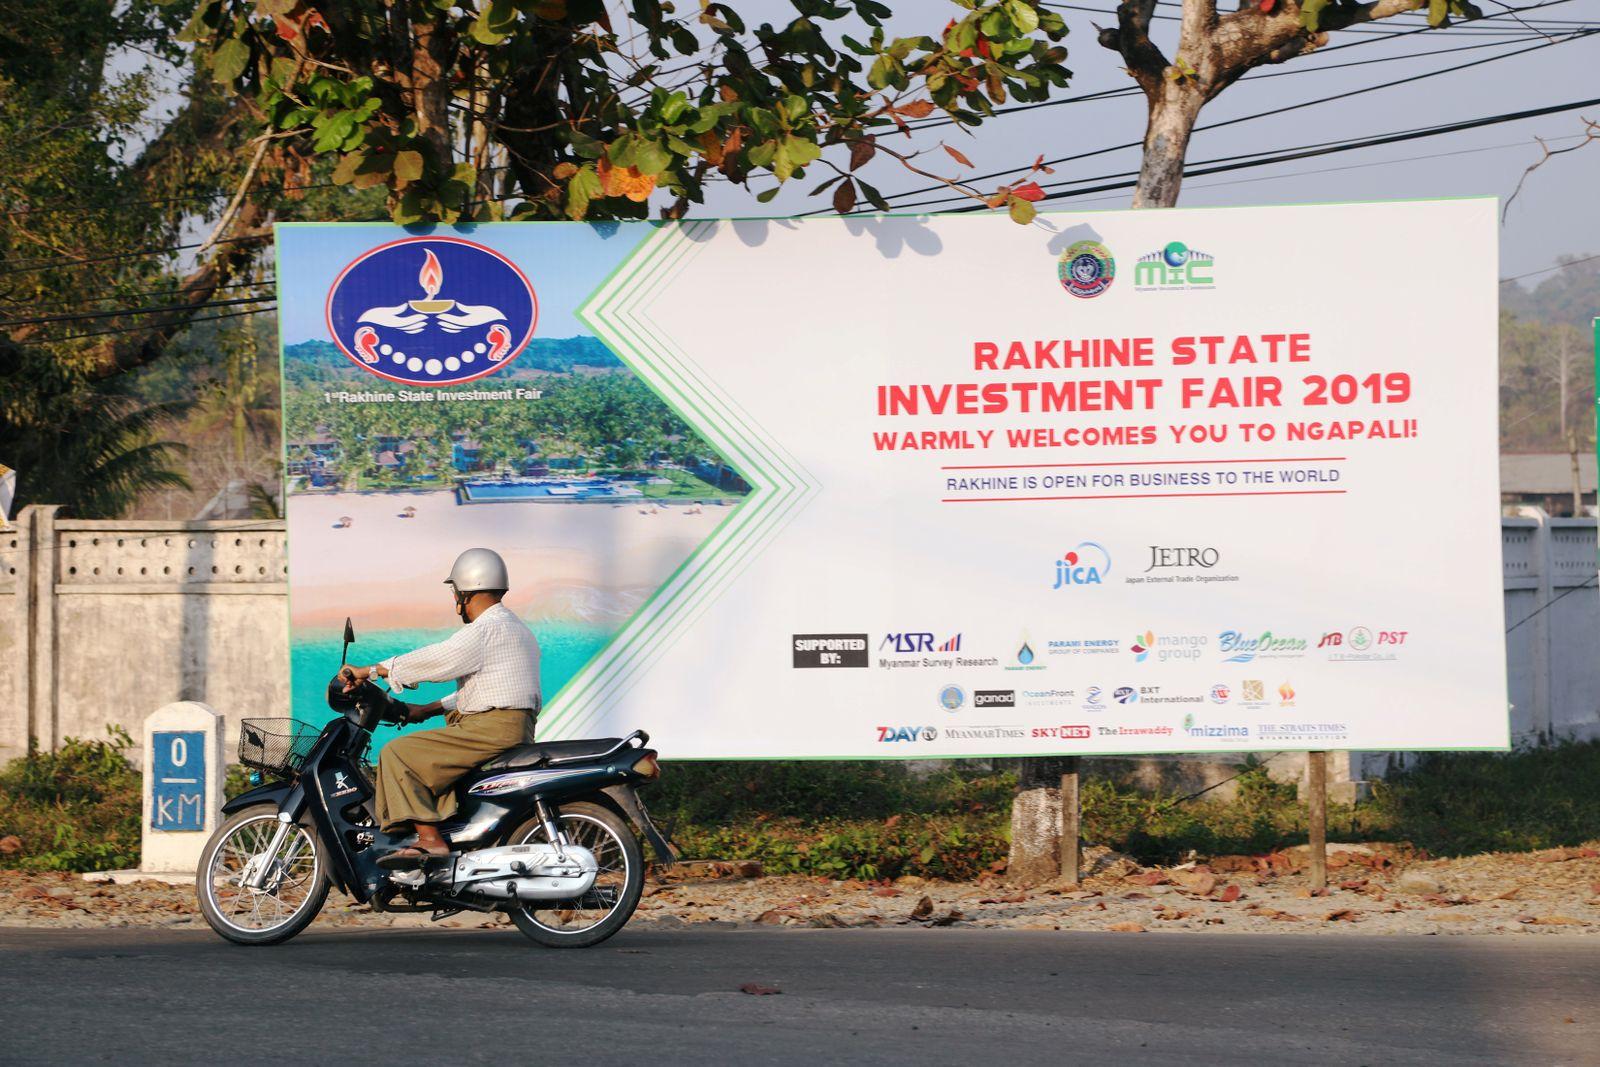 MYANMAR-RAKHINE/INVESTMENT